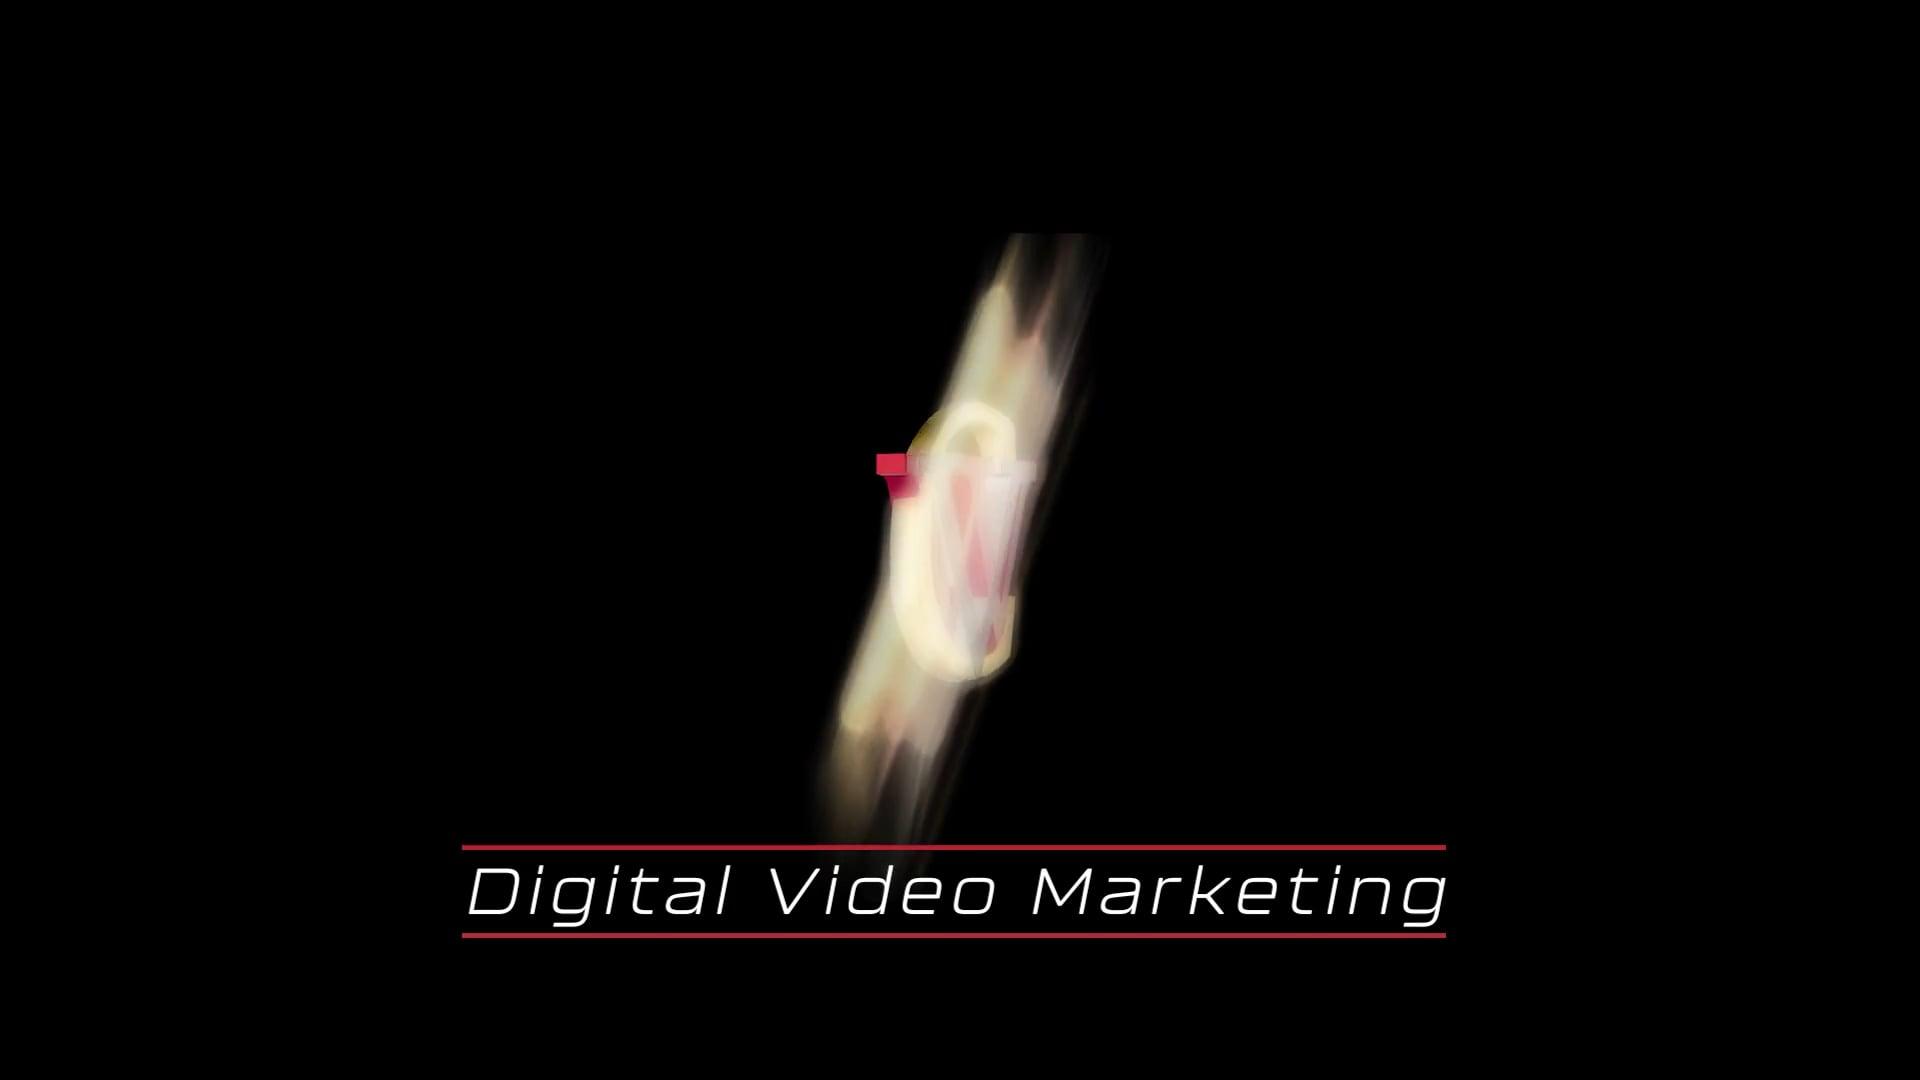 Digital Video Marketing